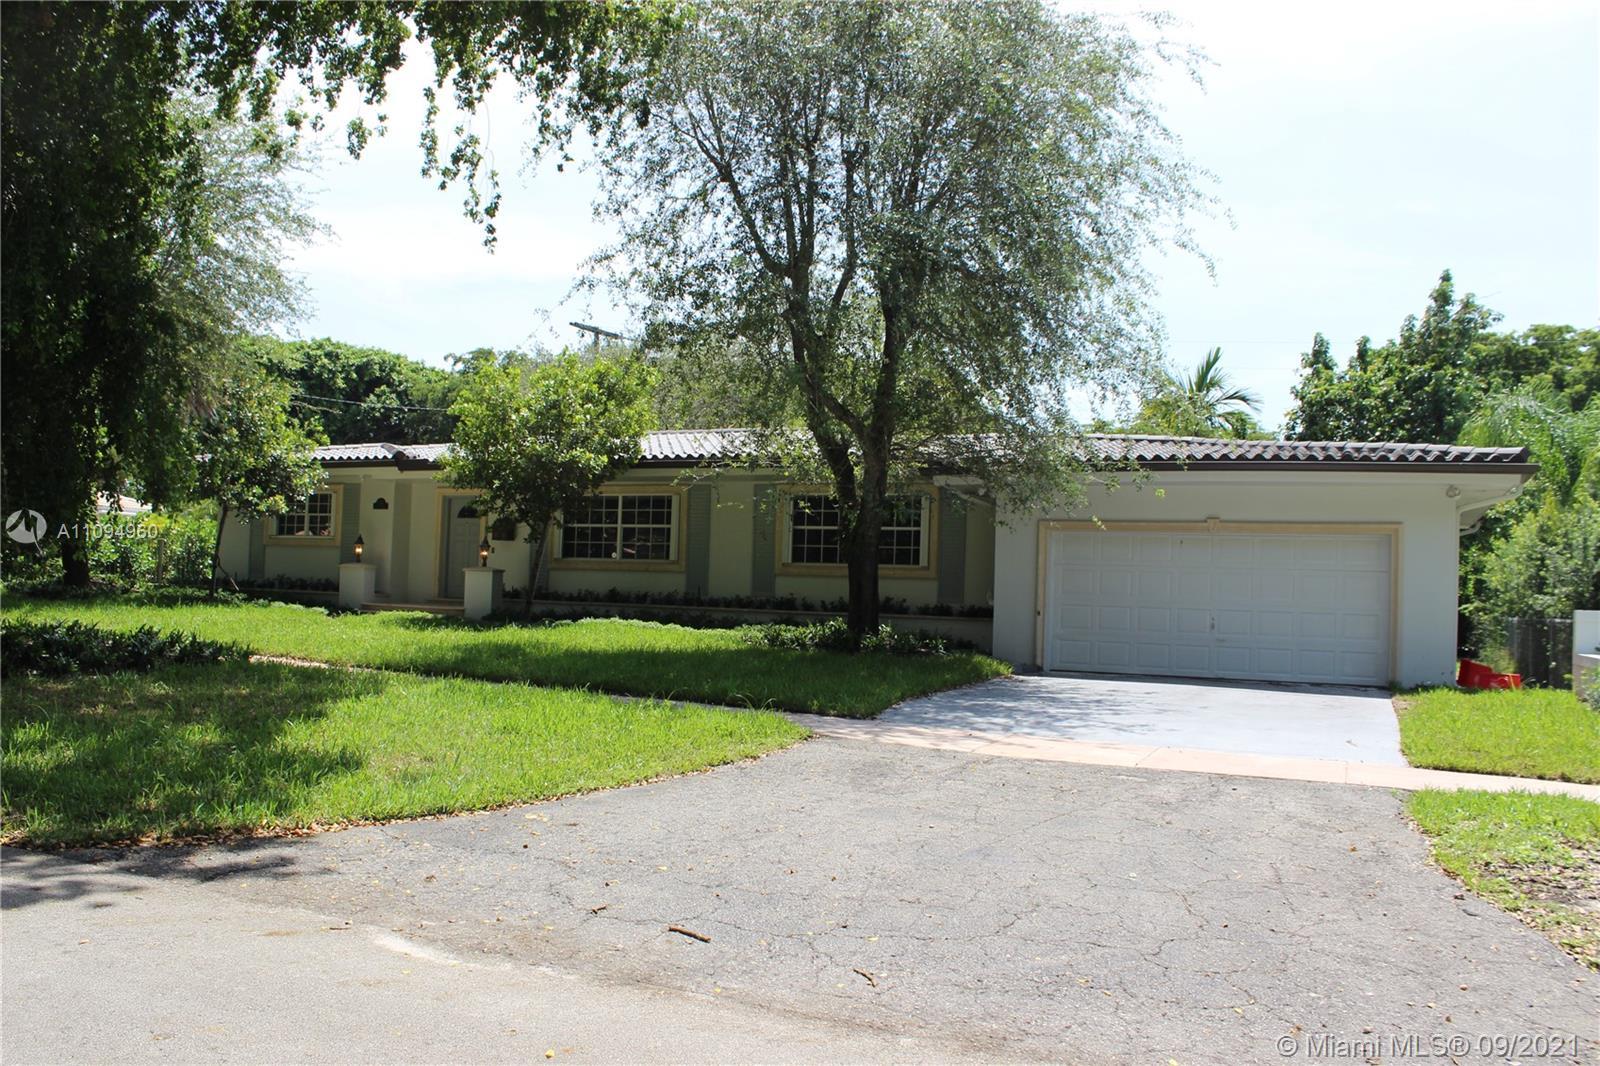 South Miami - 500 San Juan Dr, Coral Gables, FL 33143